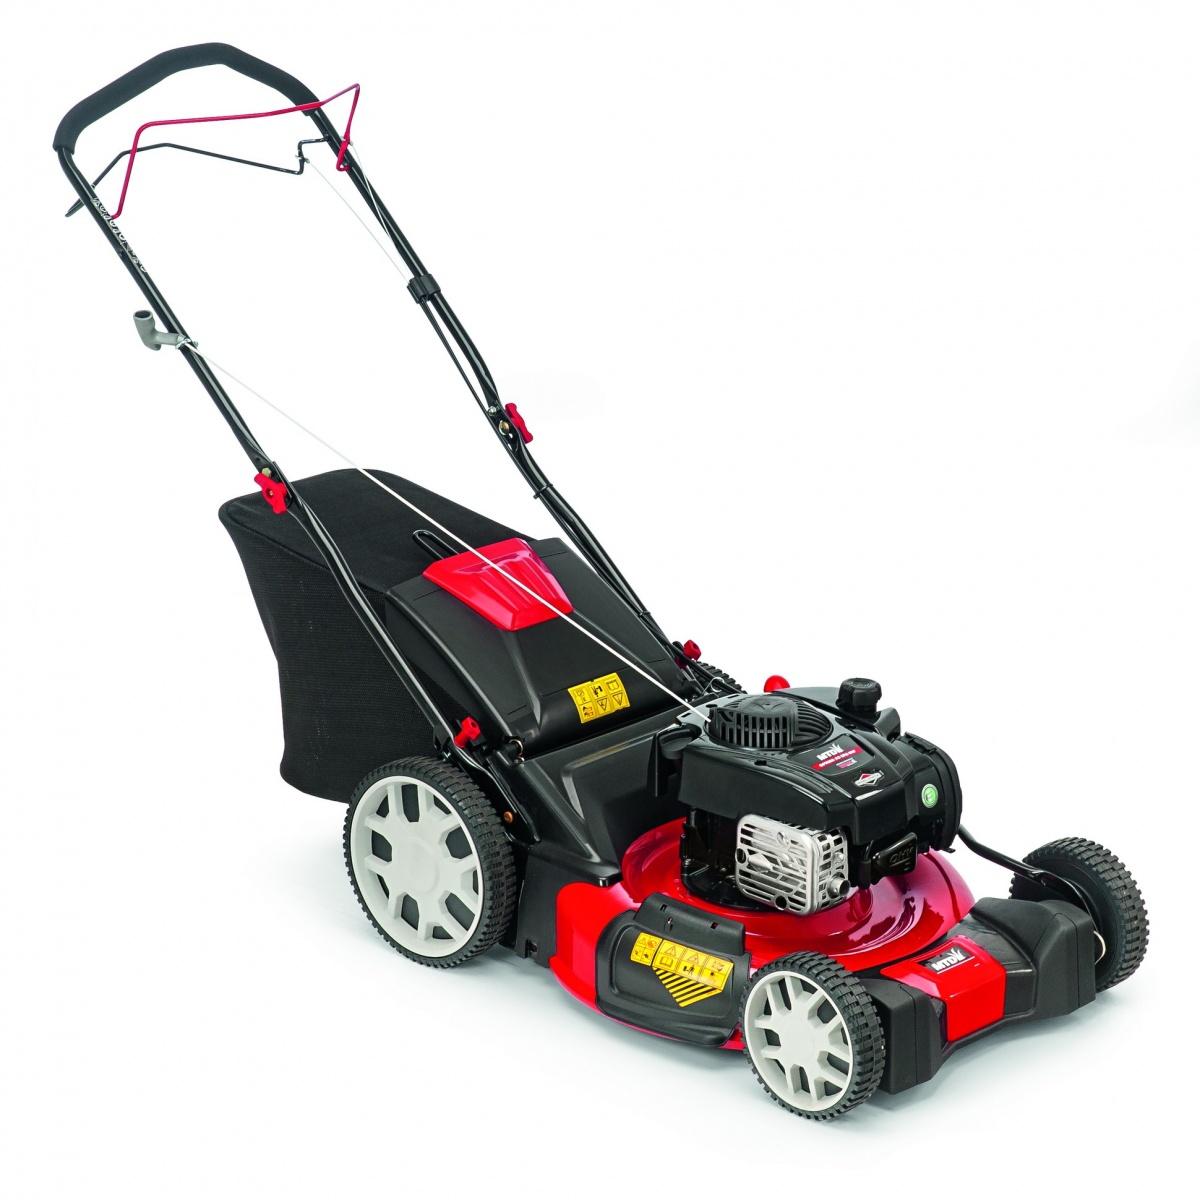 MTD OPTIMA 53 SPB HW - travní sekačka s benzinovým motorem a pojezdem + DÁREK